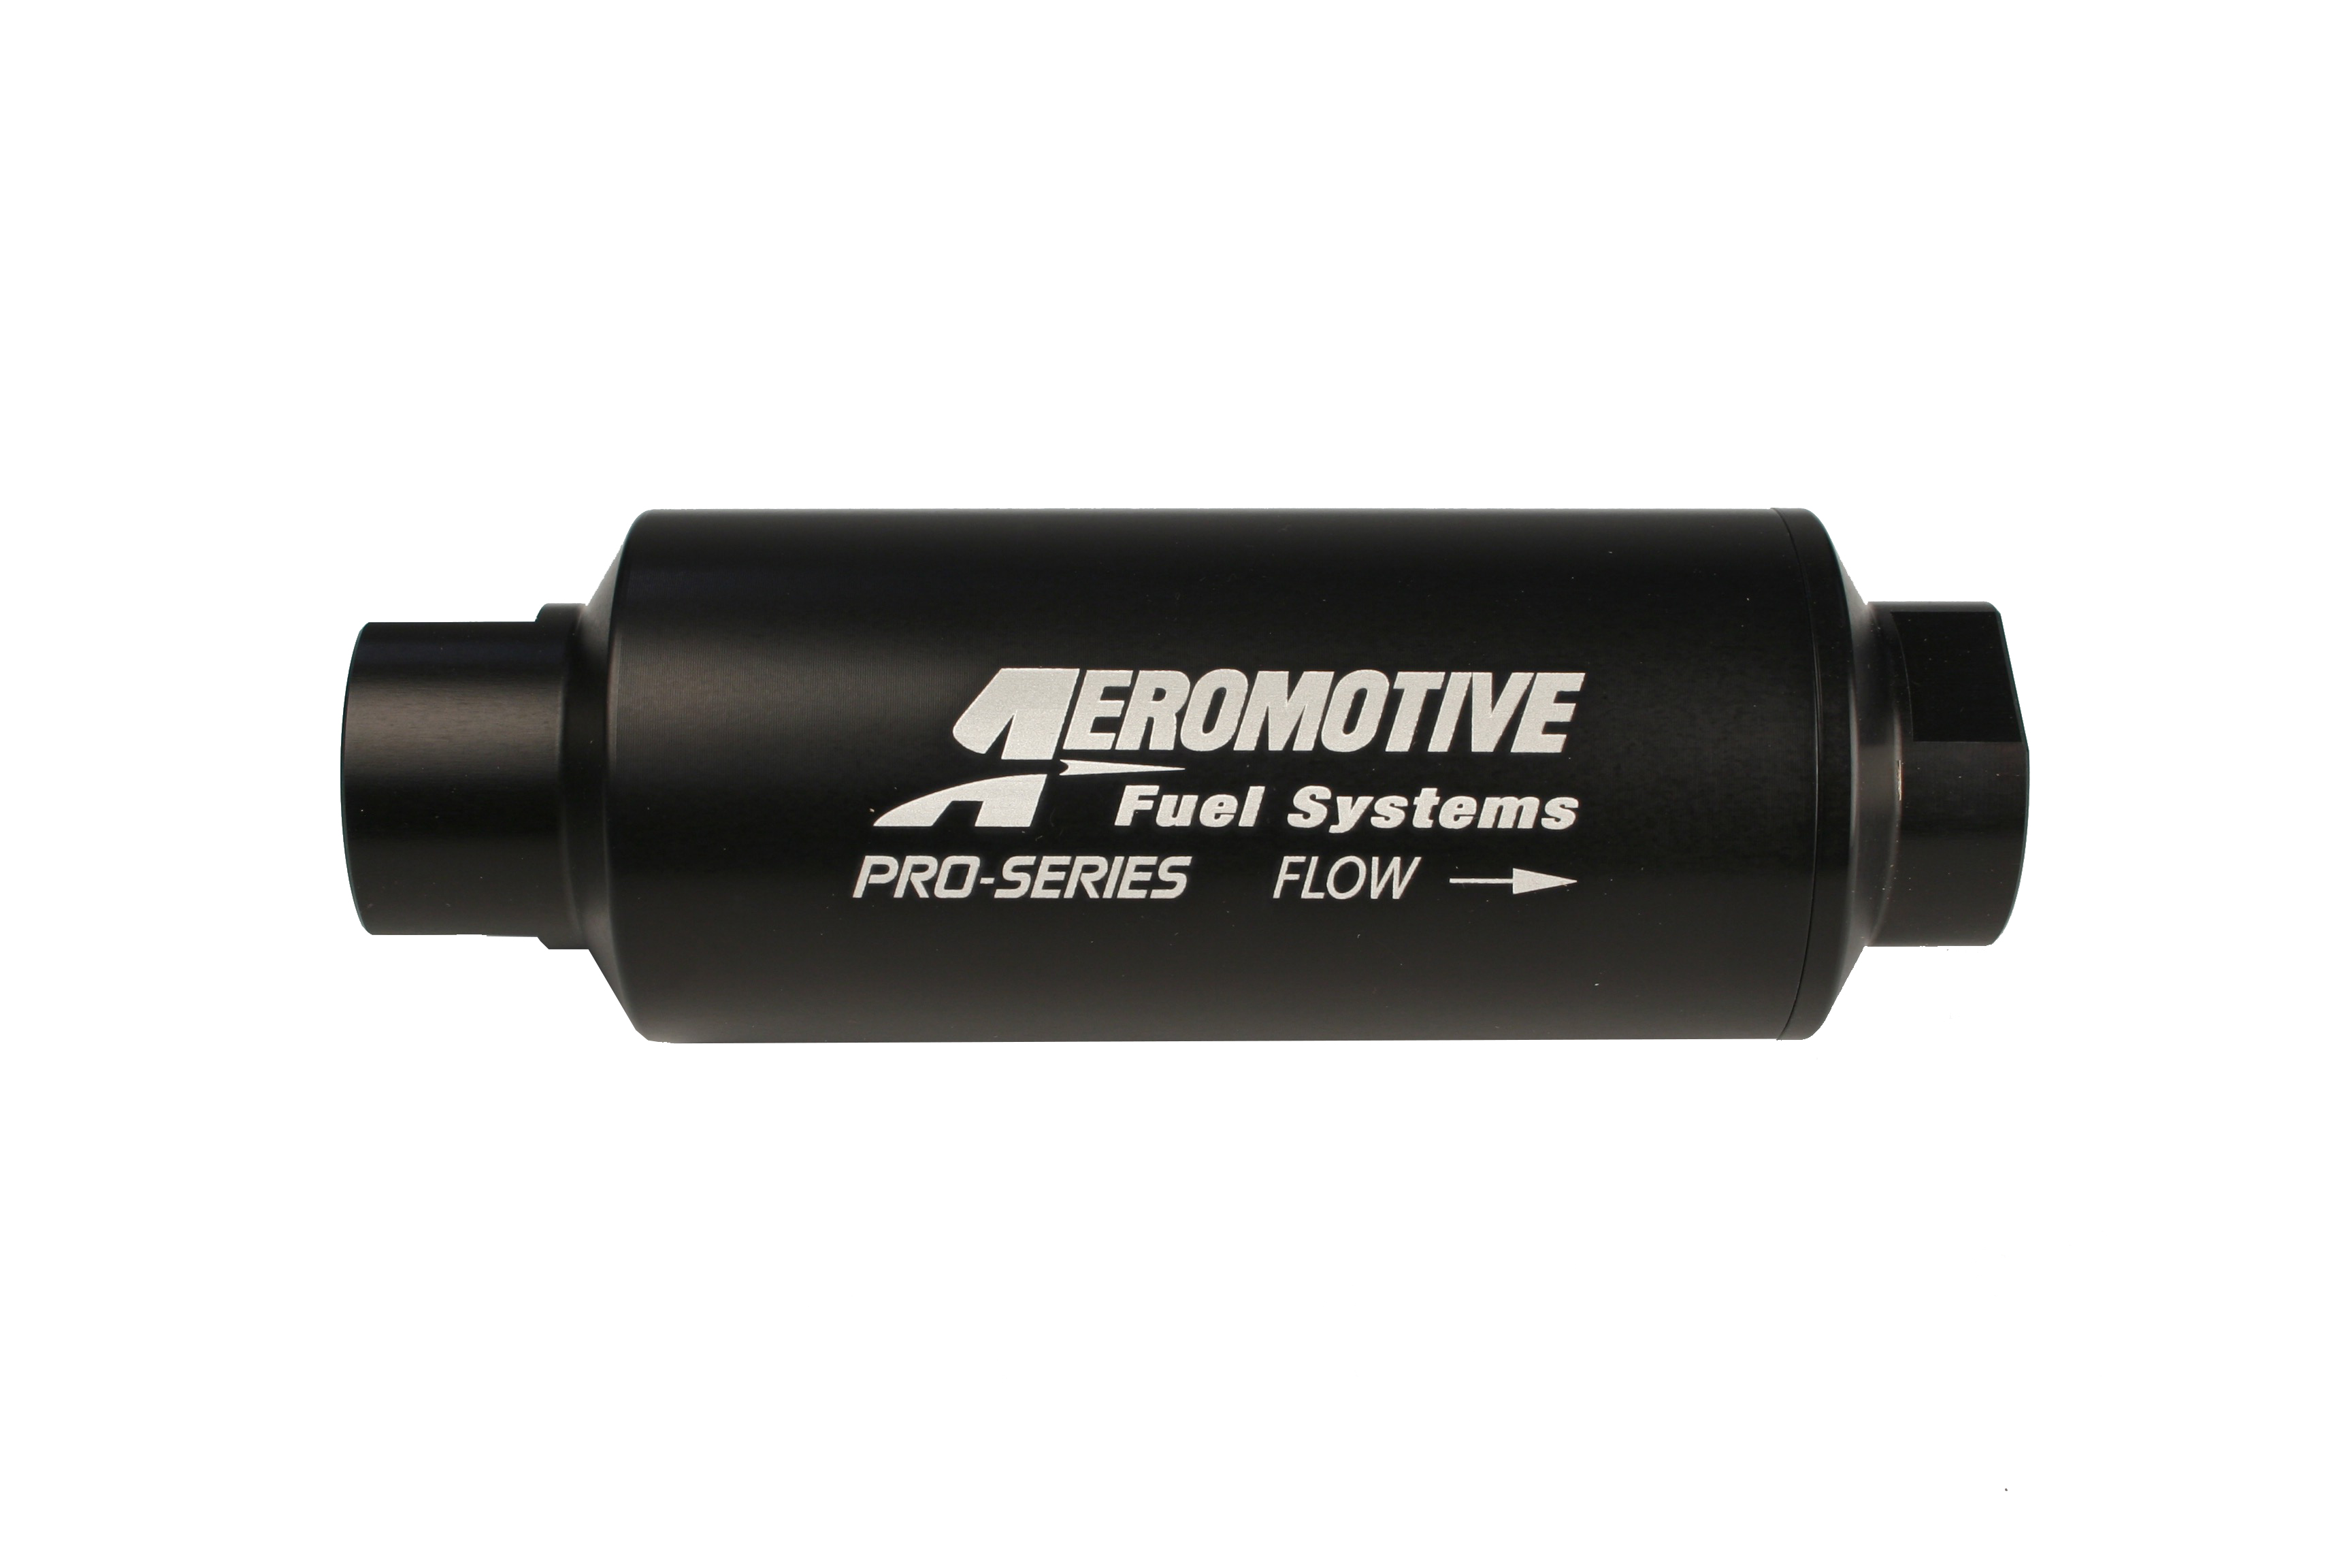 Pro-Series 100 Micron, ORB-12 Fuel Filter - Aeromotive, IncAeromotive, Inc